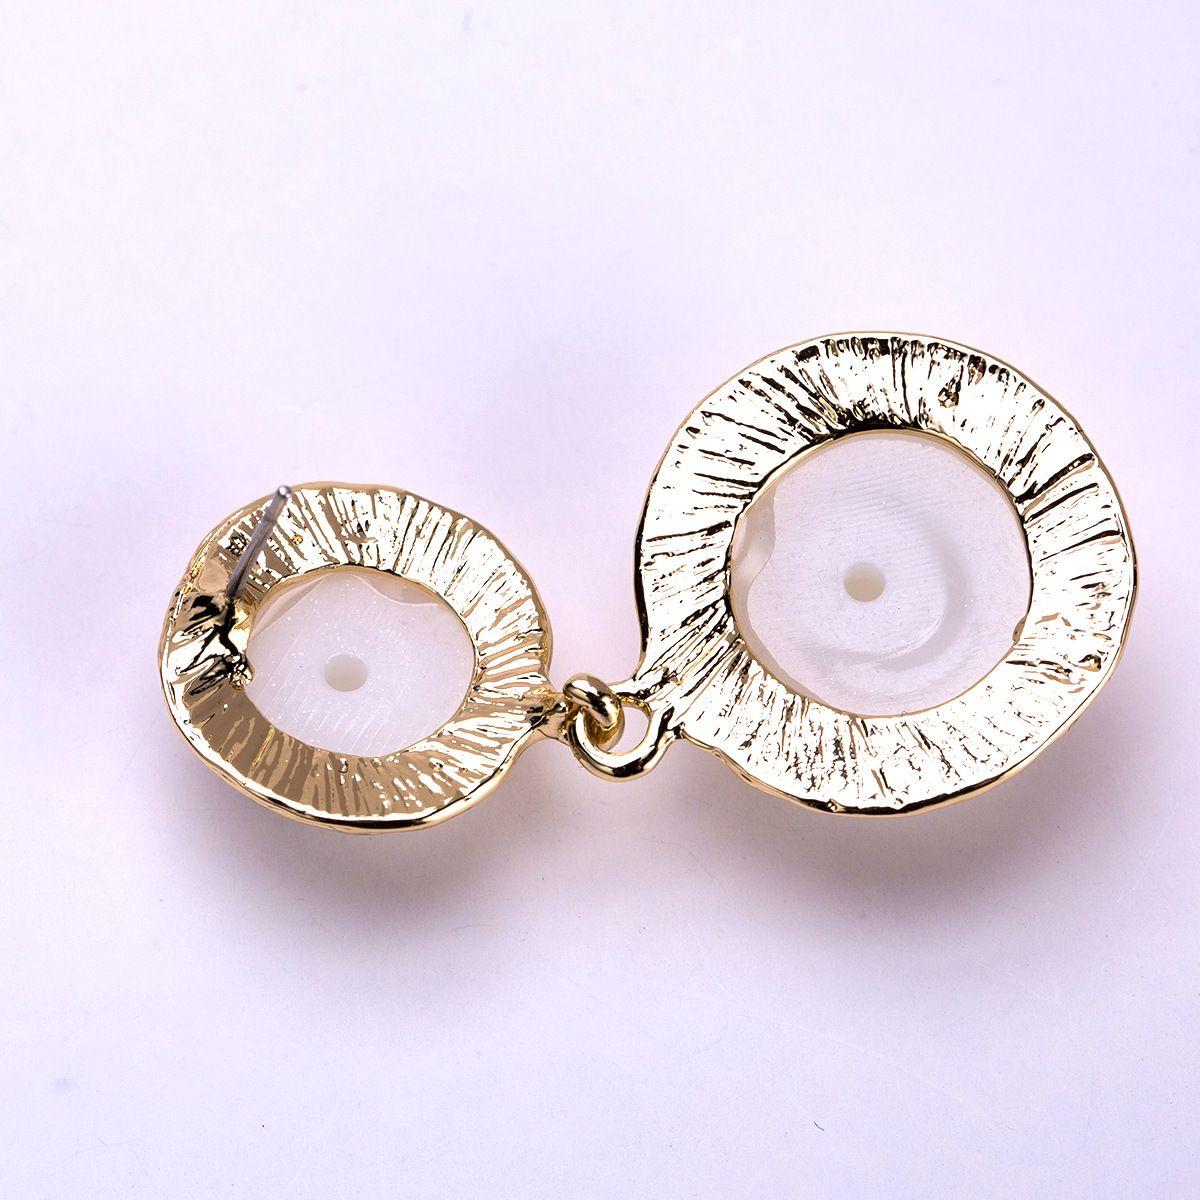 drop Earrings for women Luxury boho personality Dangle earrings Imitation pearls simple Vintage geometric fashion Jewelry wholesale 2018 new